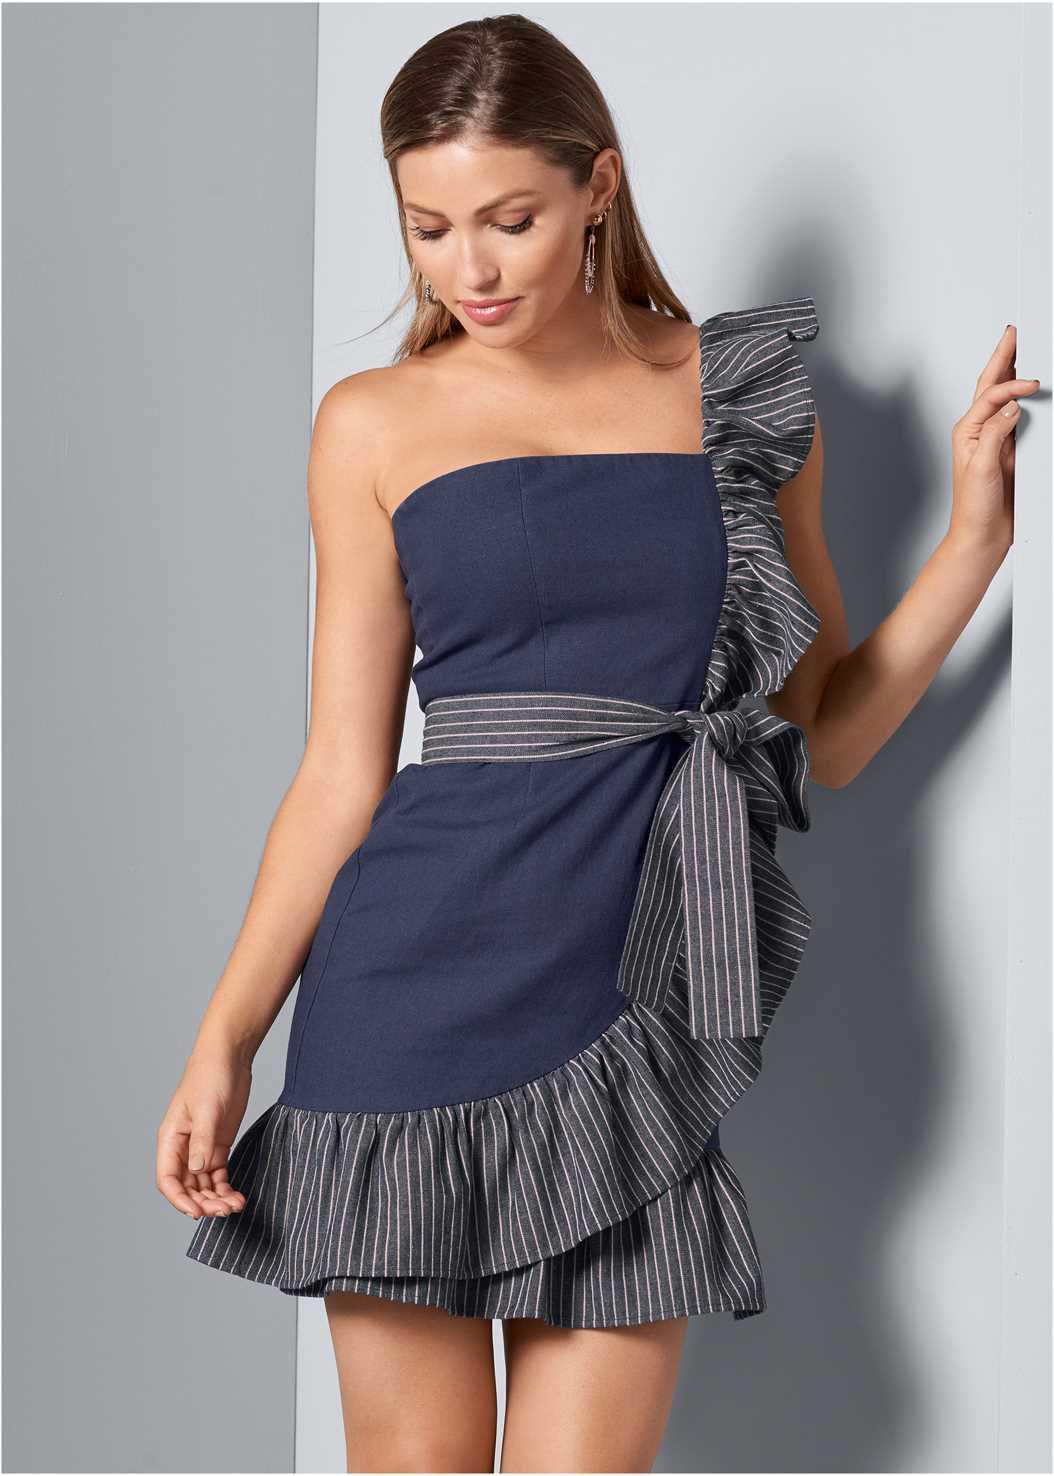 Ruffle Detail Denim Dress,Smooth Longline Push Up Bra,Beaded Hoop Earrings